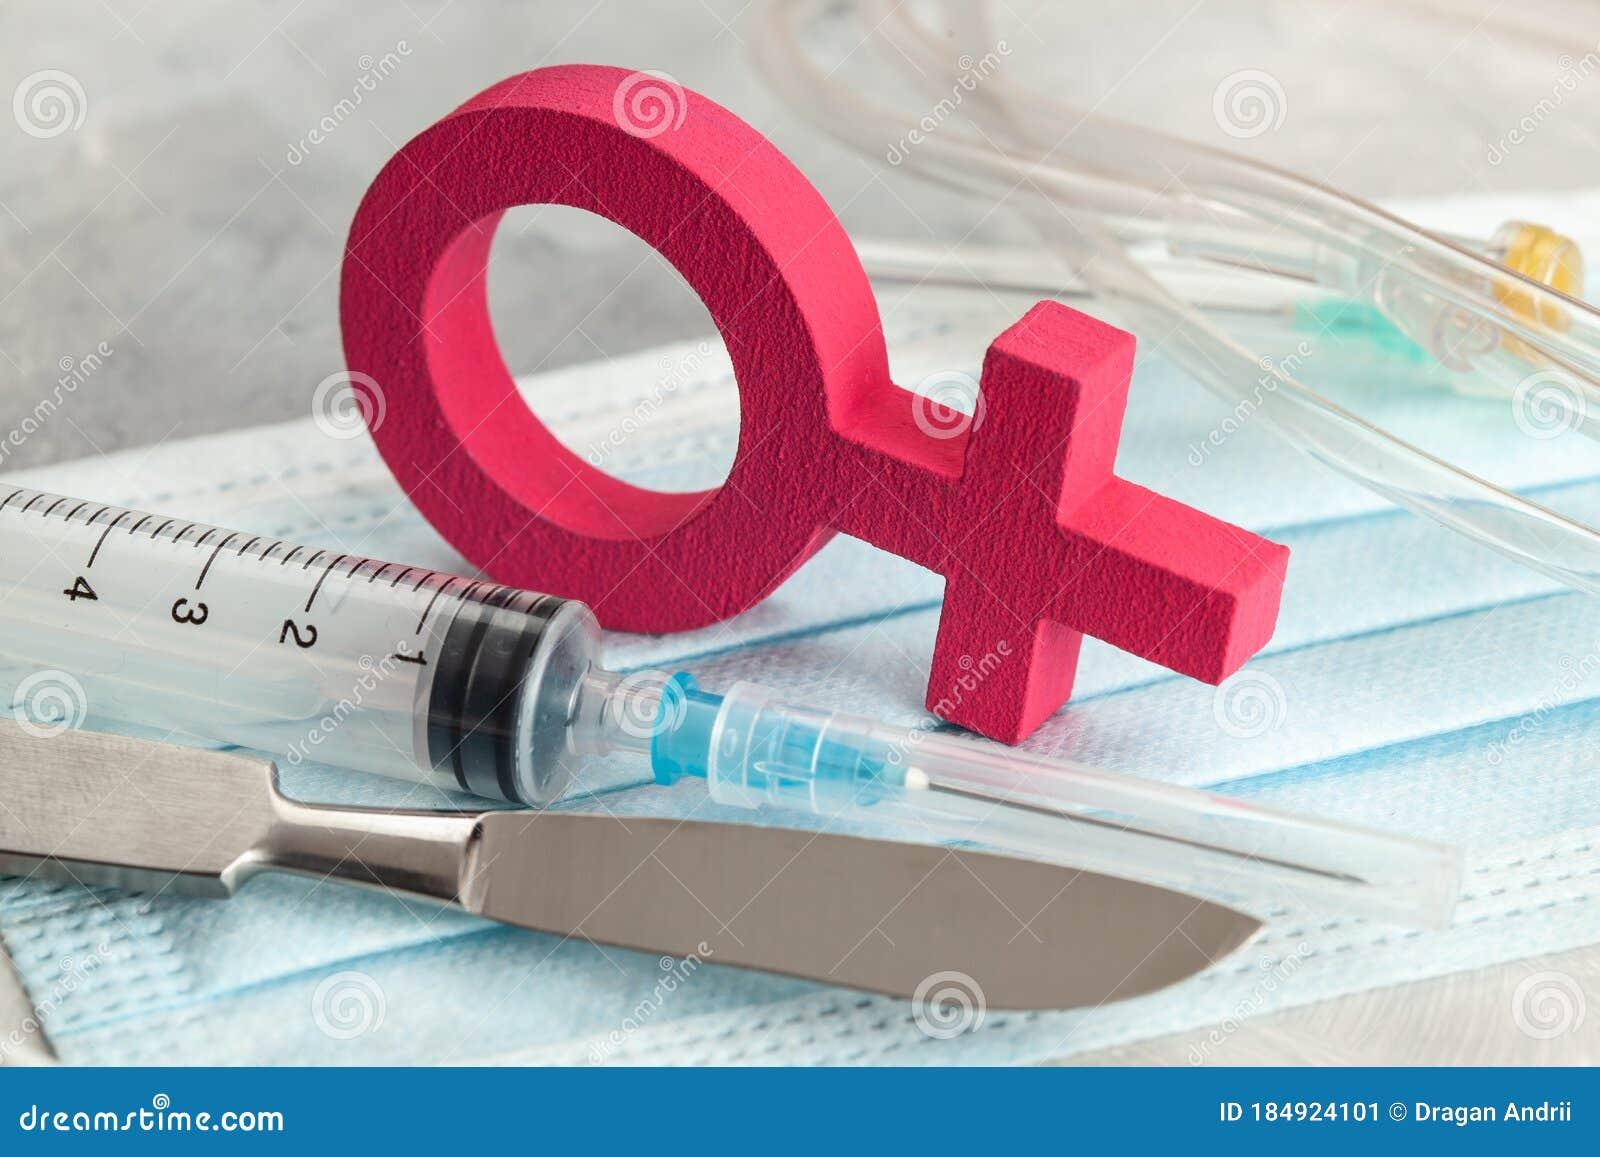 Male sex change operation